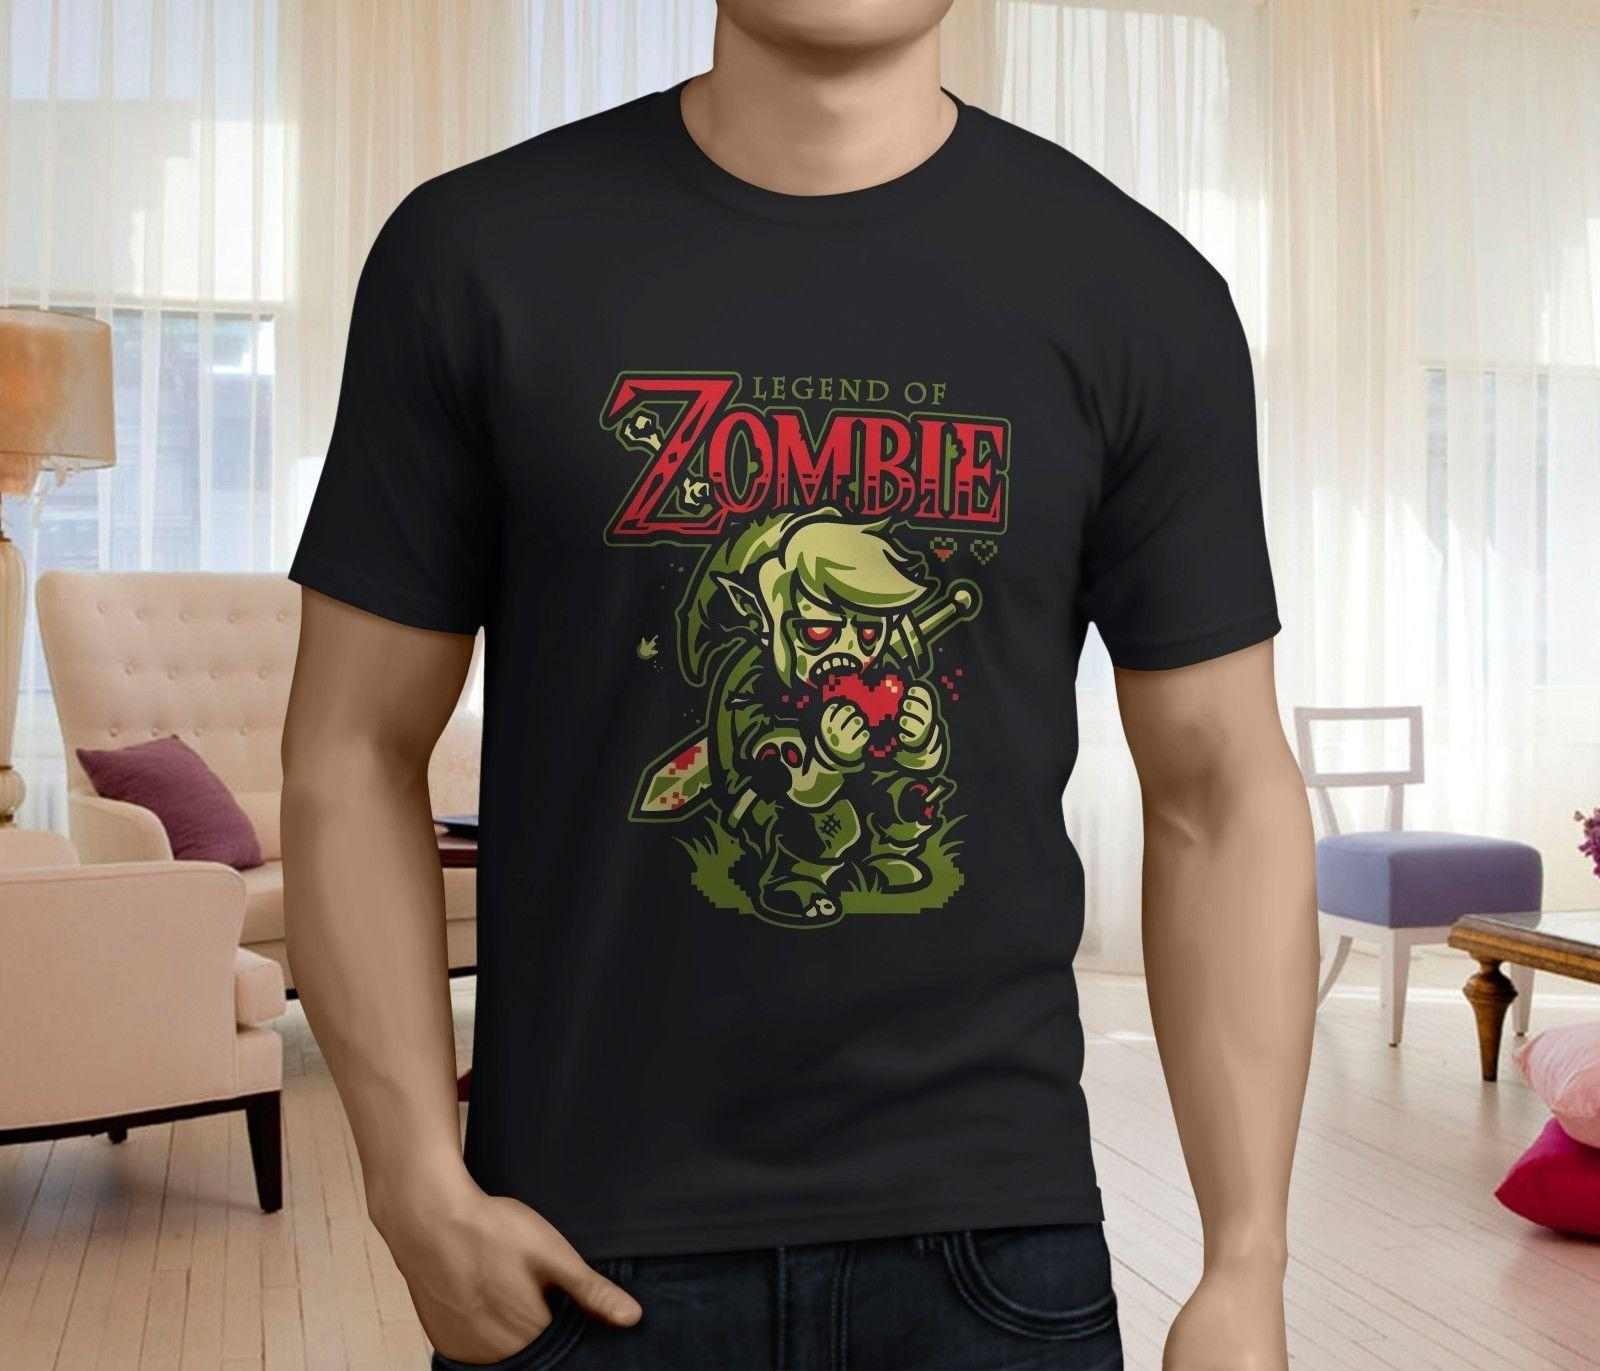 ddc6c112f66d New The Legend Of Zelda Zombie Funny Style Men s Black T-shirt Size ...